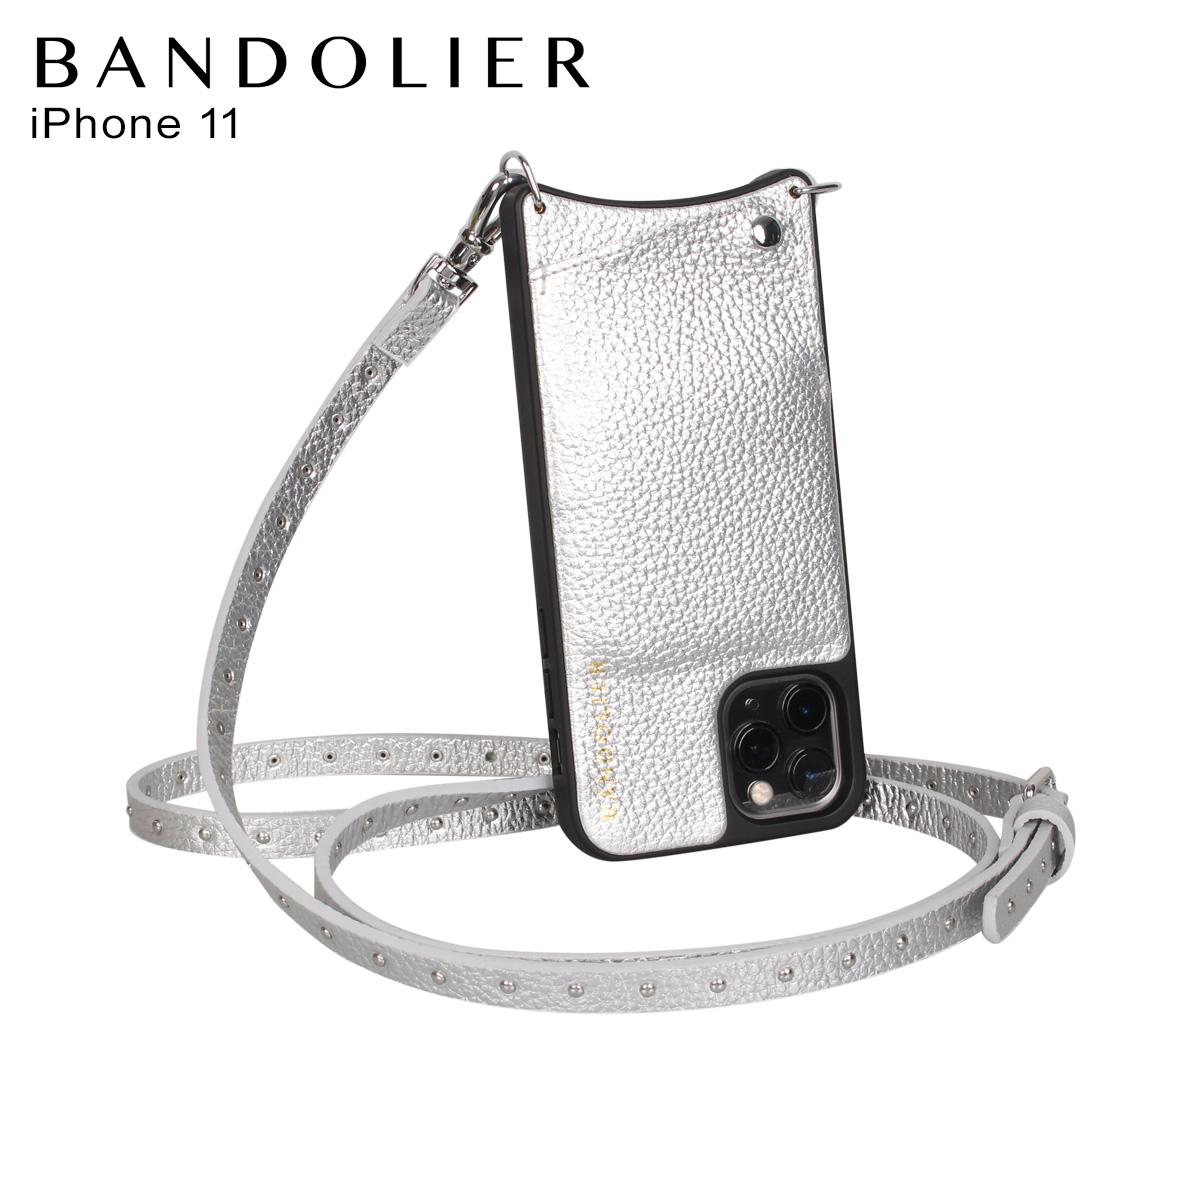 BANDOLIER バンドリヤー iPhone11 ケース スマホ 携帯 ショルダー アイフォン メンズ レディース レザー NICOLE RICH SILVER シルバー 10NIC